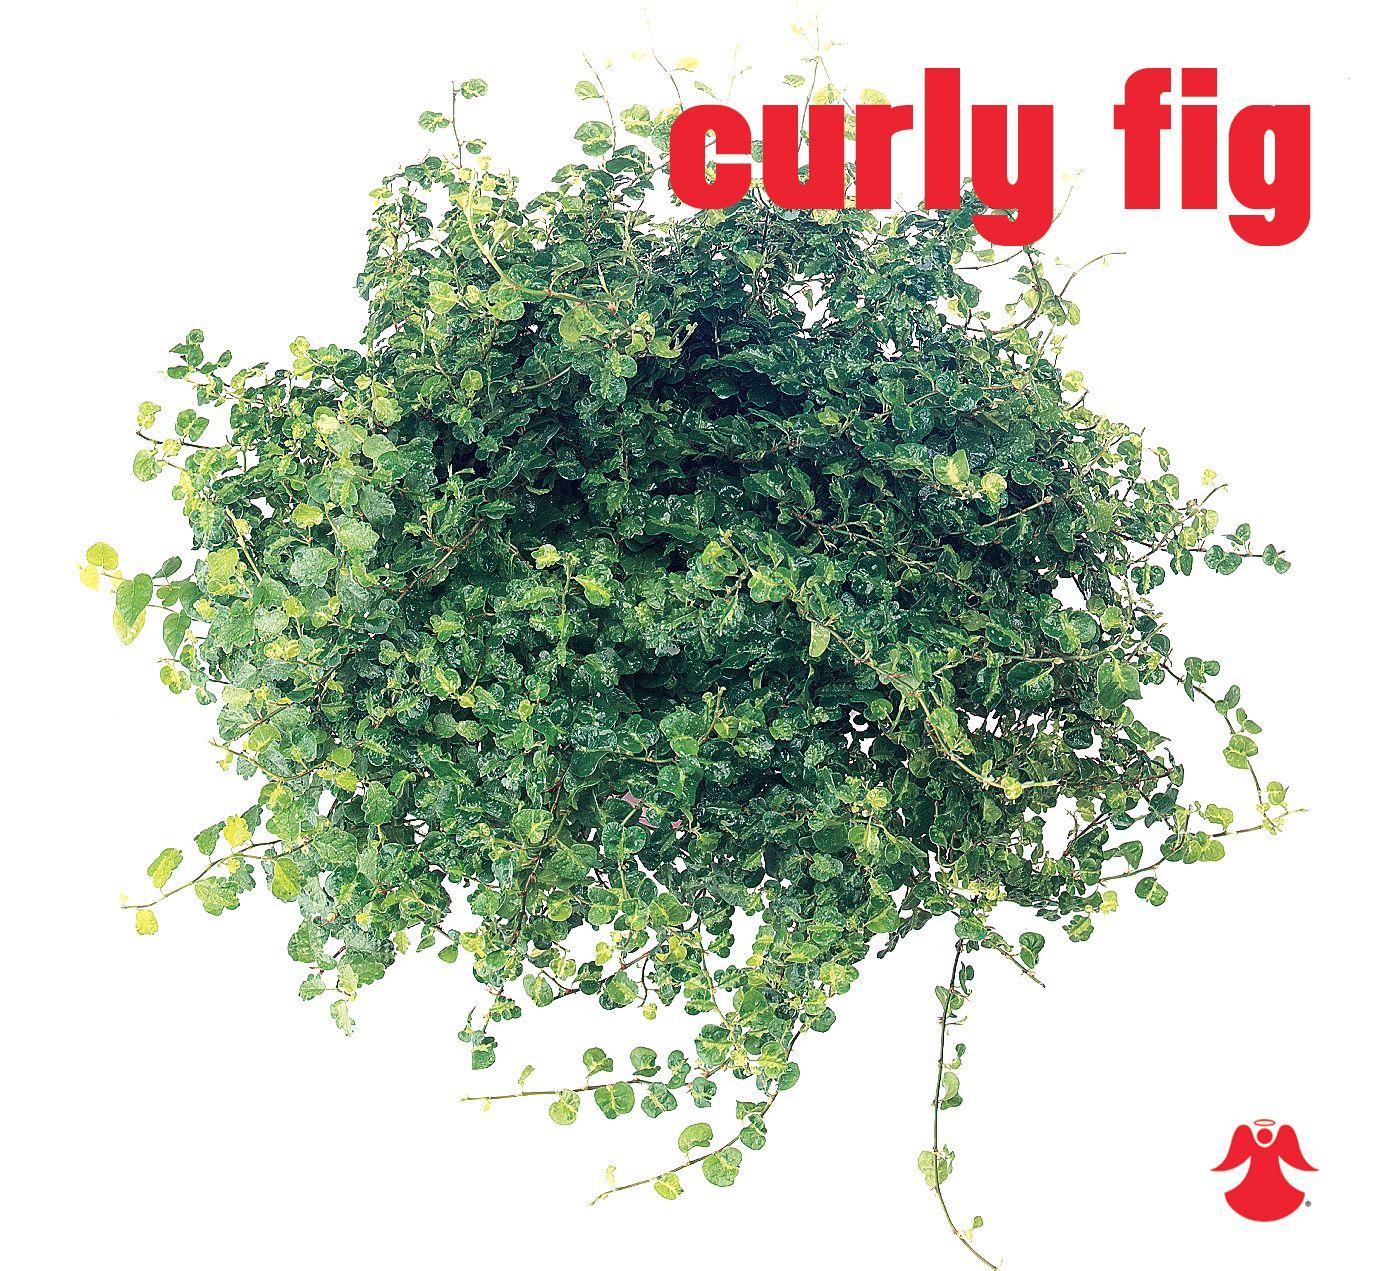 Ficus Curly Fig Ficus Pumila Aka Creeping Fig Or Climbing Fig